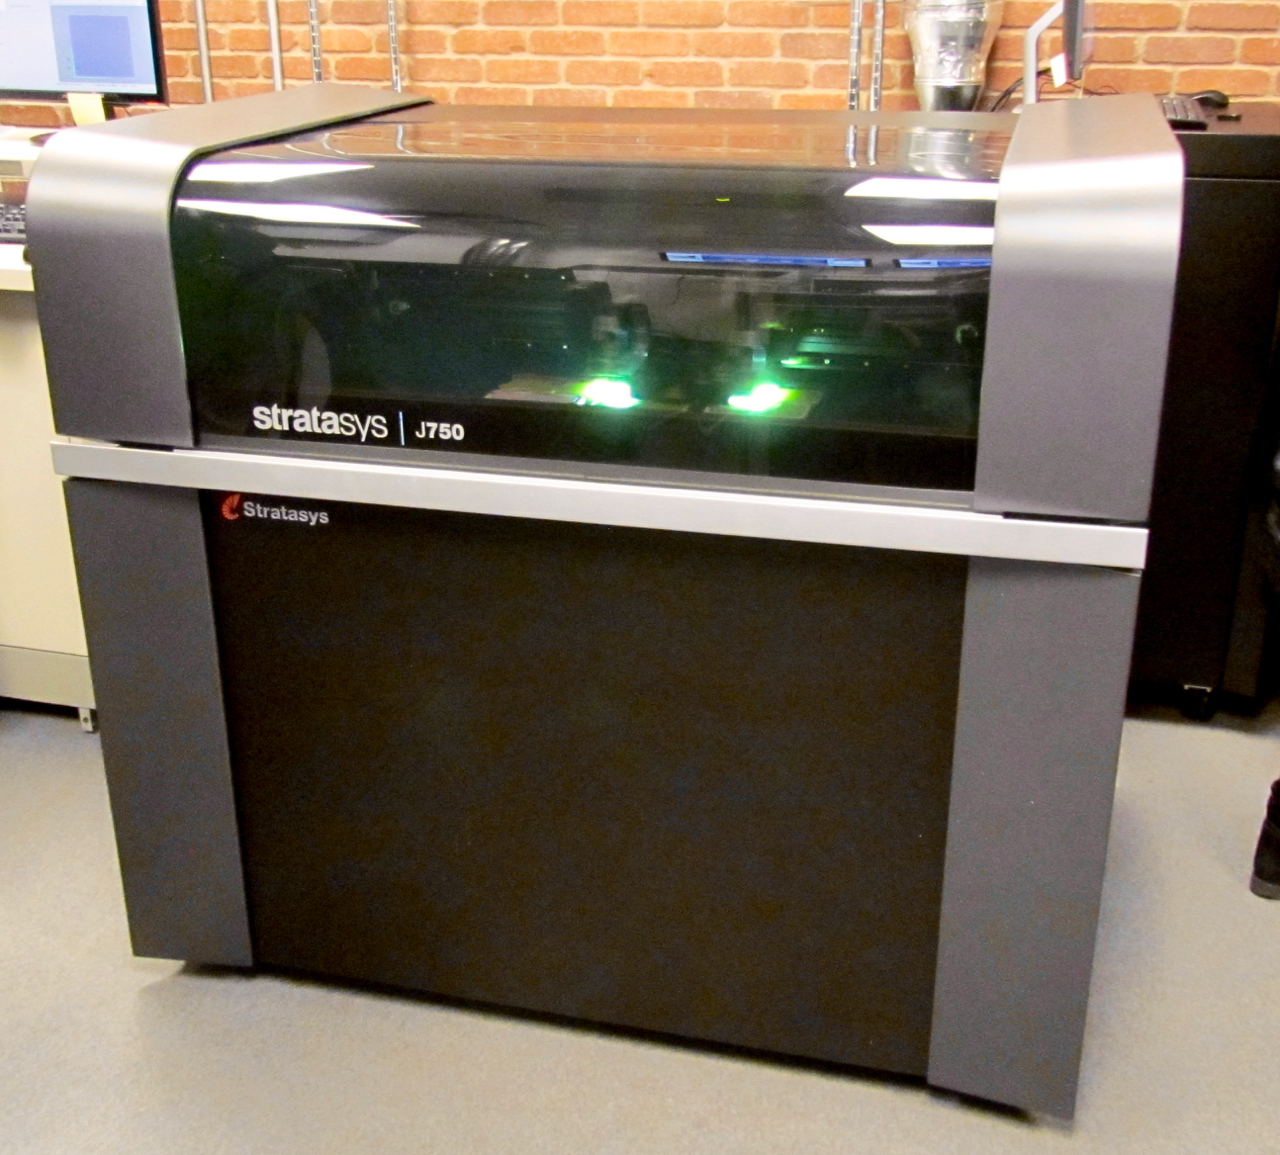 Stratasys' Astonishing New J750 Color 3D Printer: Evolutionary AND Revolutionary